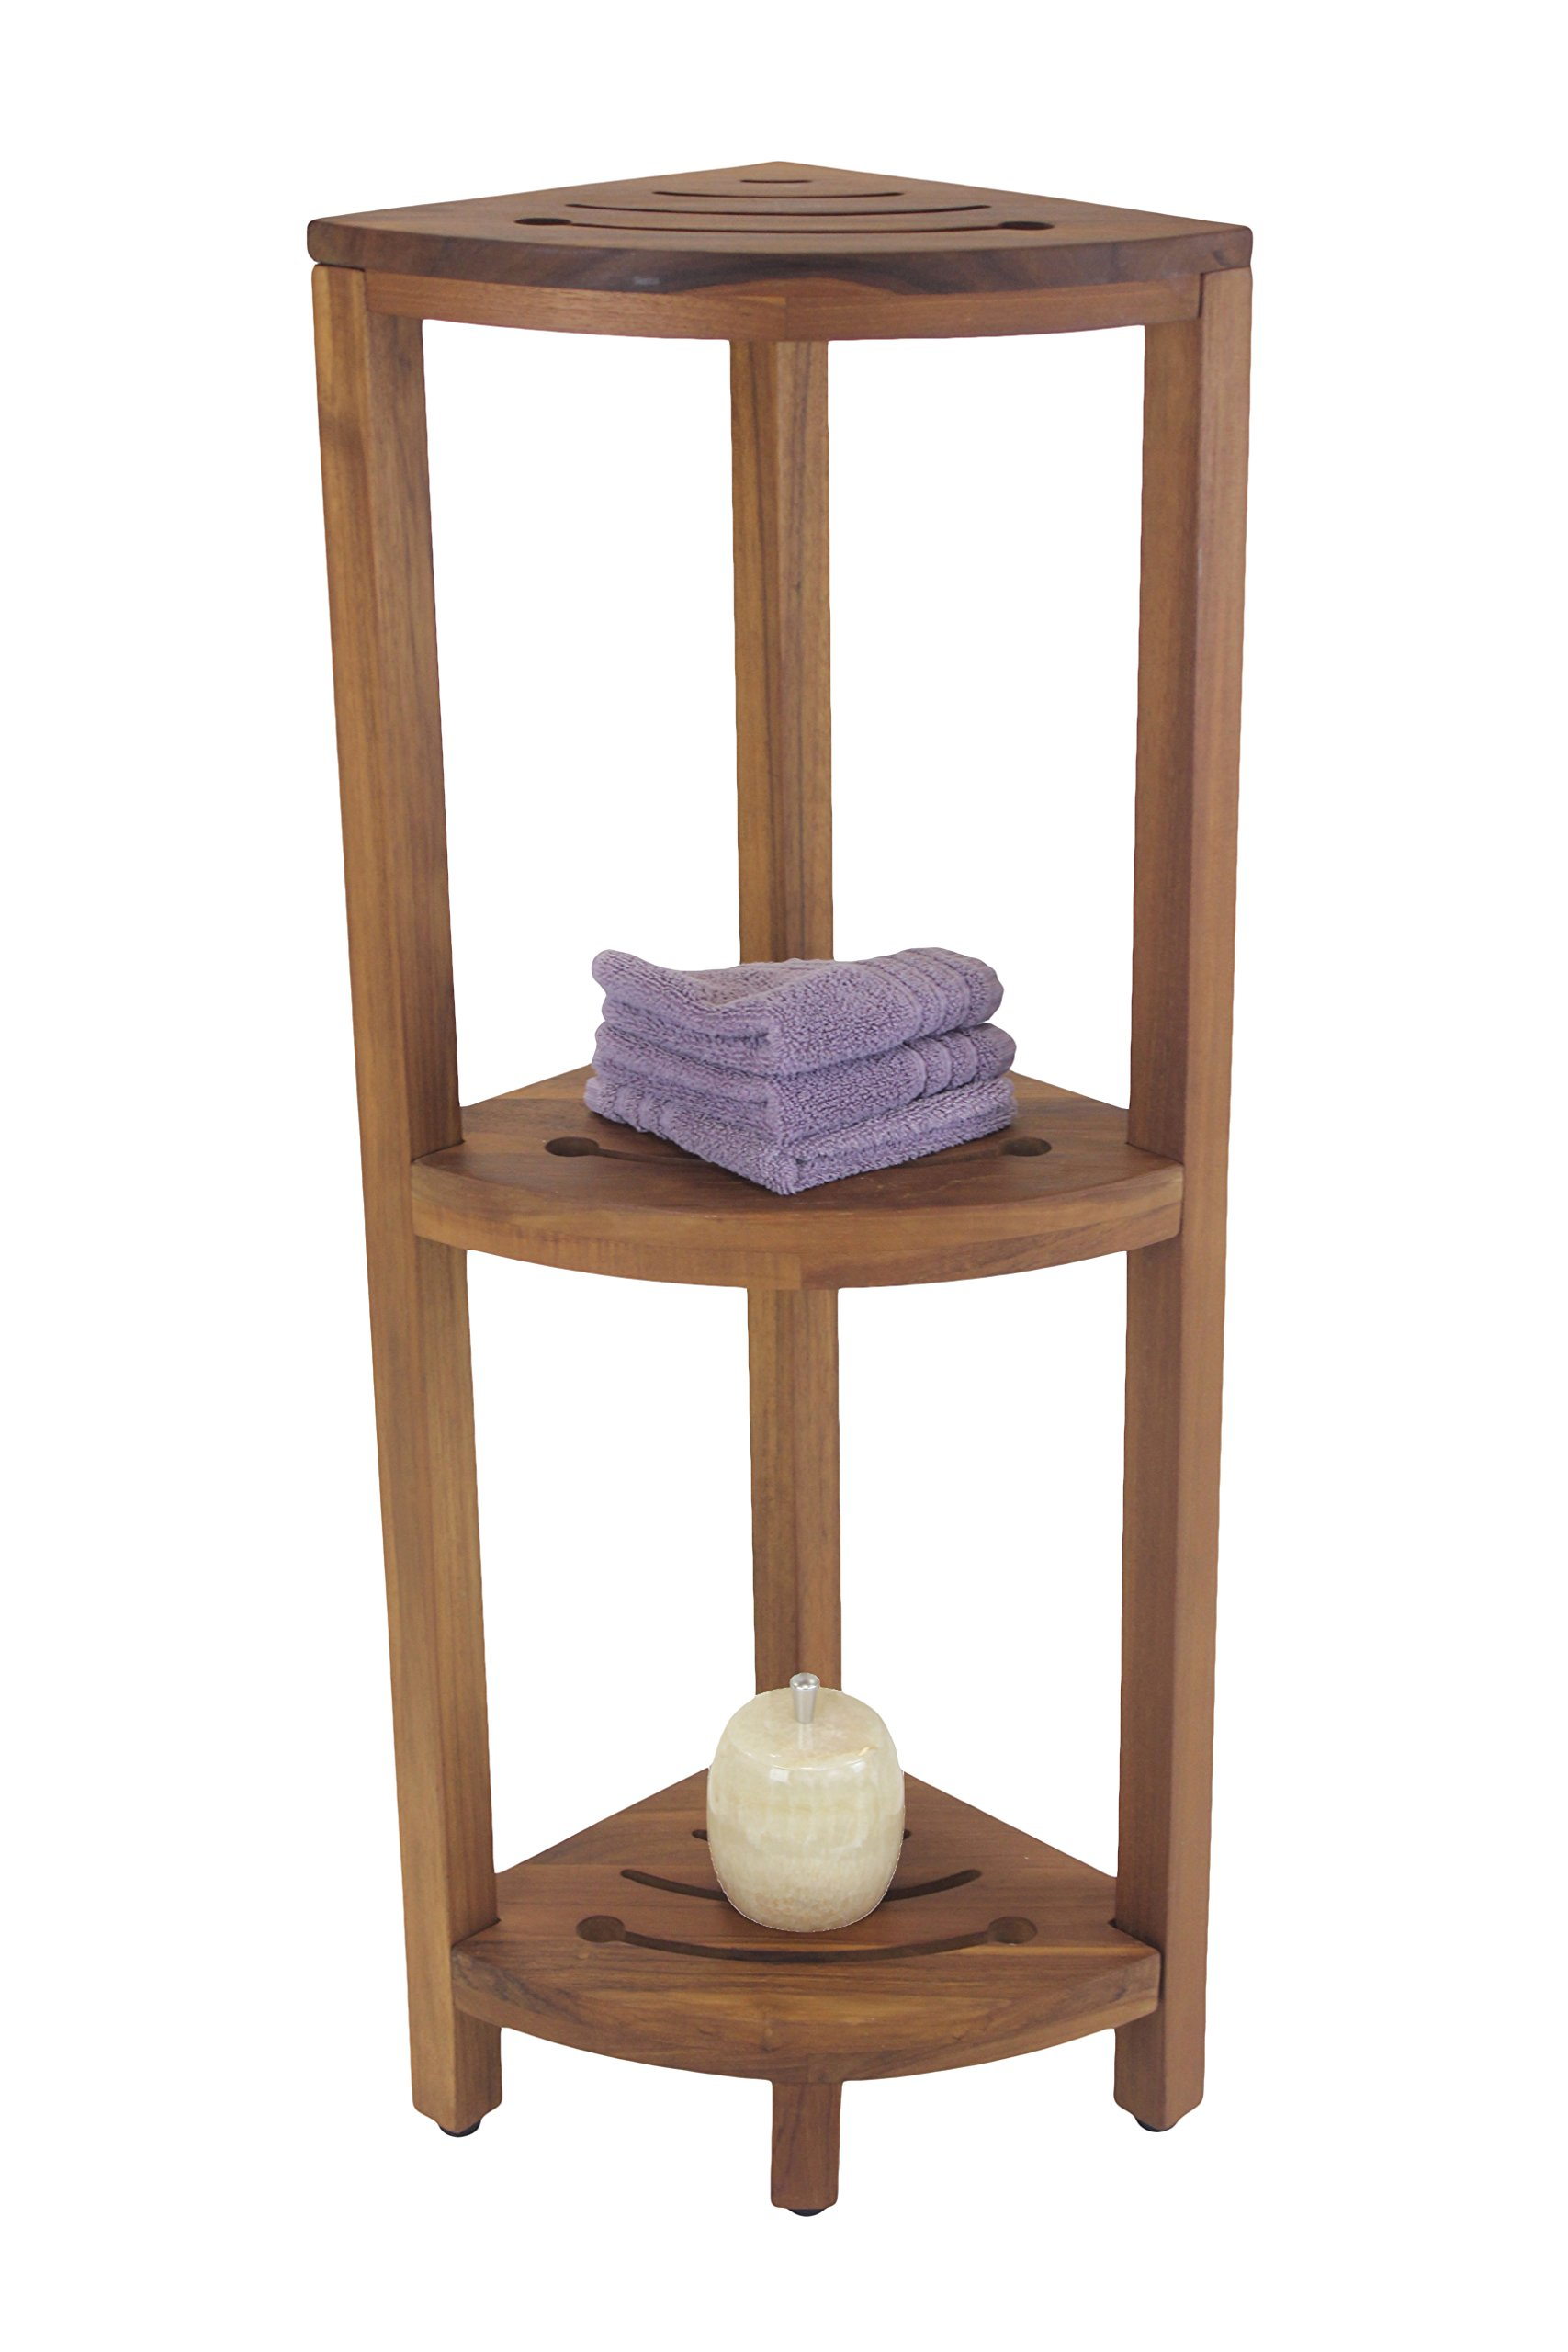 The Original Kai Corner Teak and Stainless 3 Shelf Corner Stand With Square Legs by AquaTeak